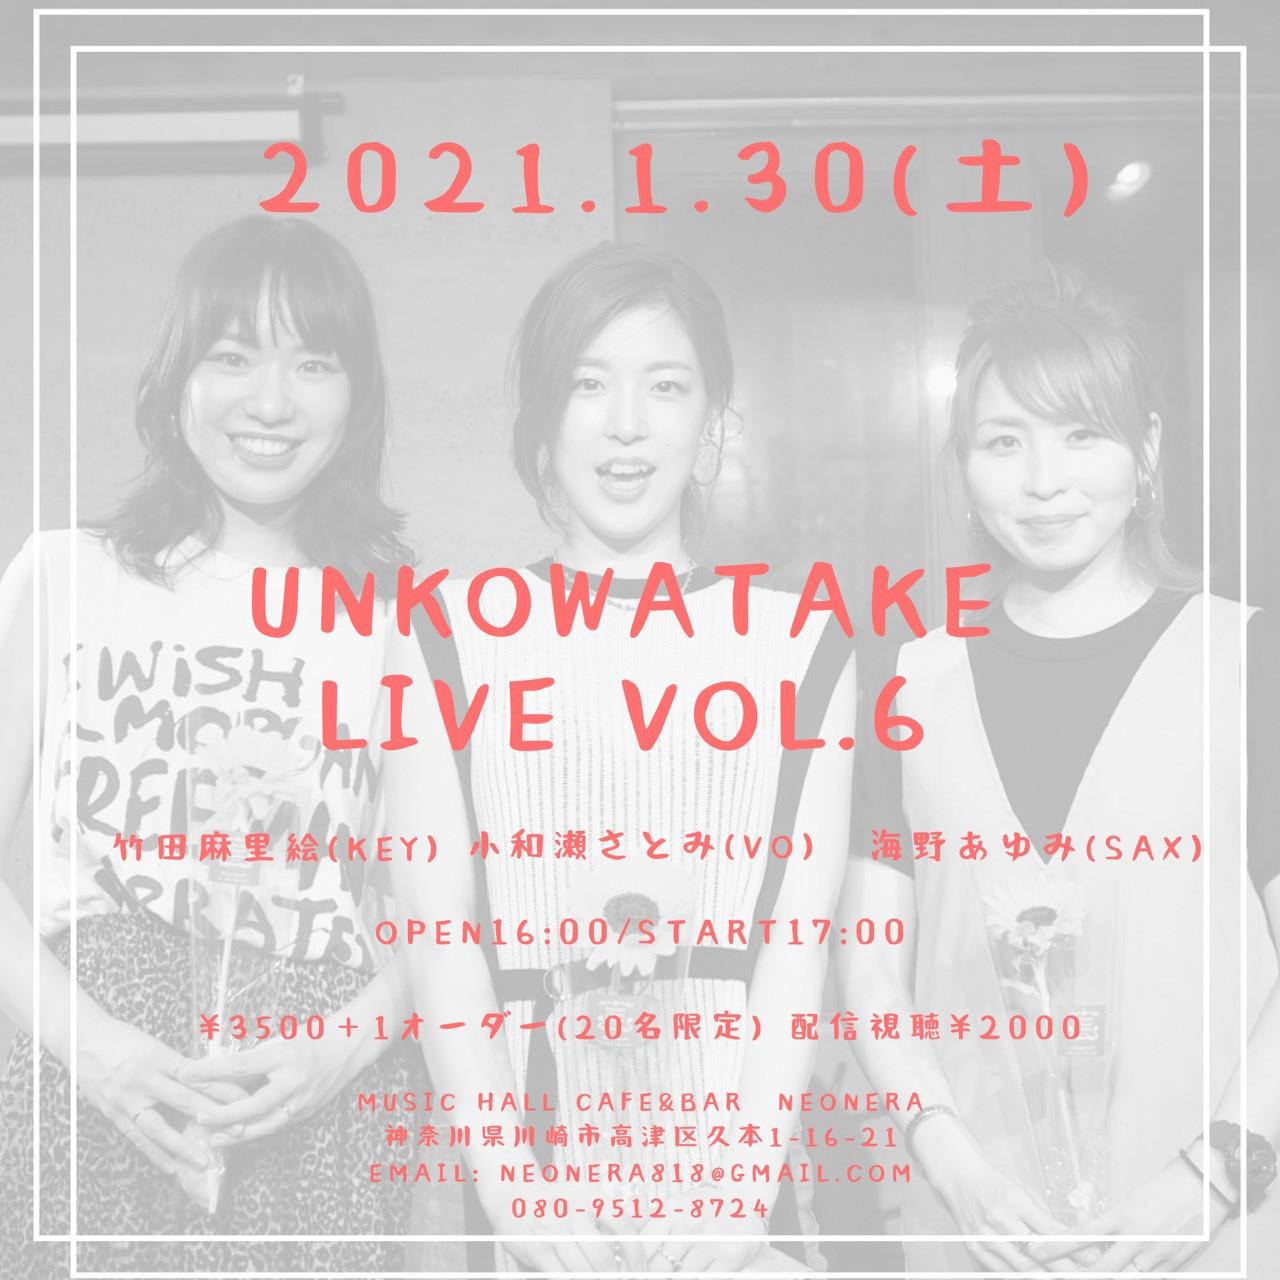 1月30日(土)UnKowaTake LIVE vol.6